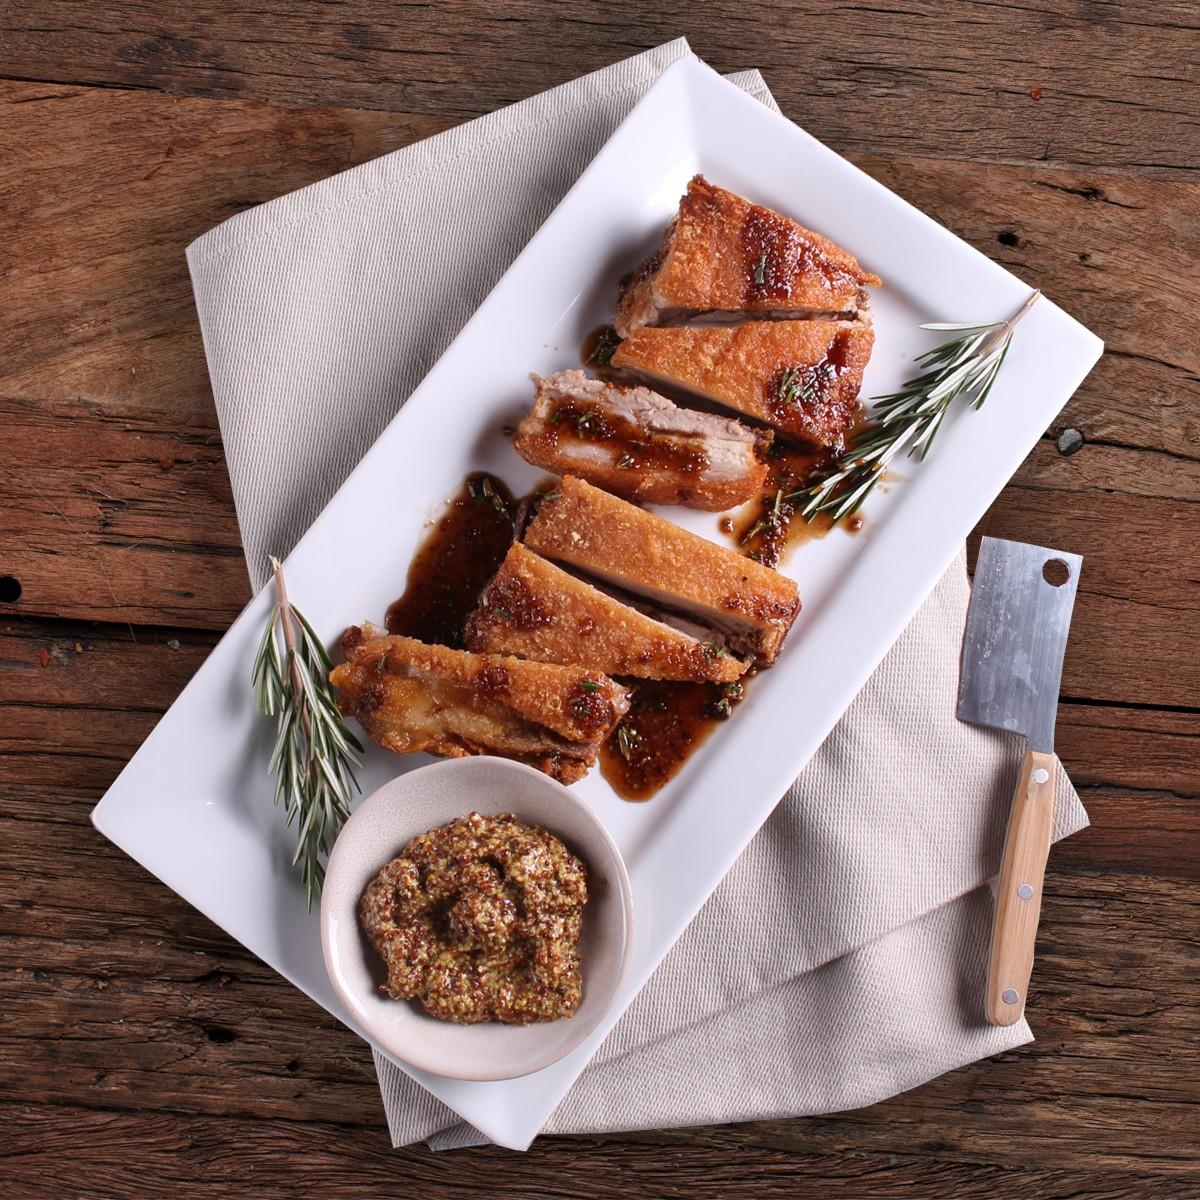 Maple Mustard Pork Belly - Three Aussie Farmers Slow Cooked Pork Belly